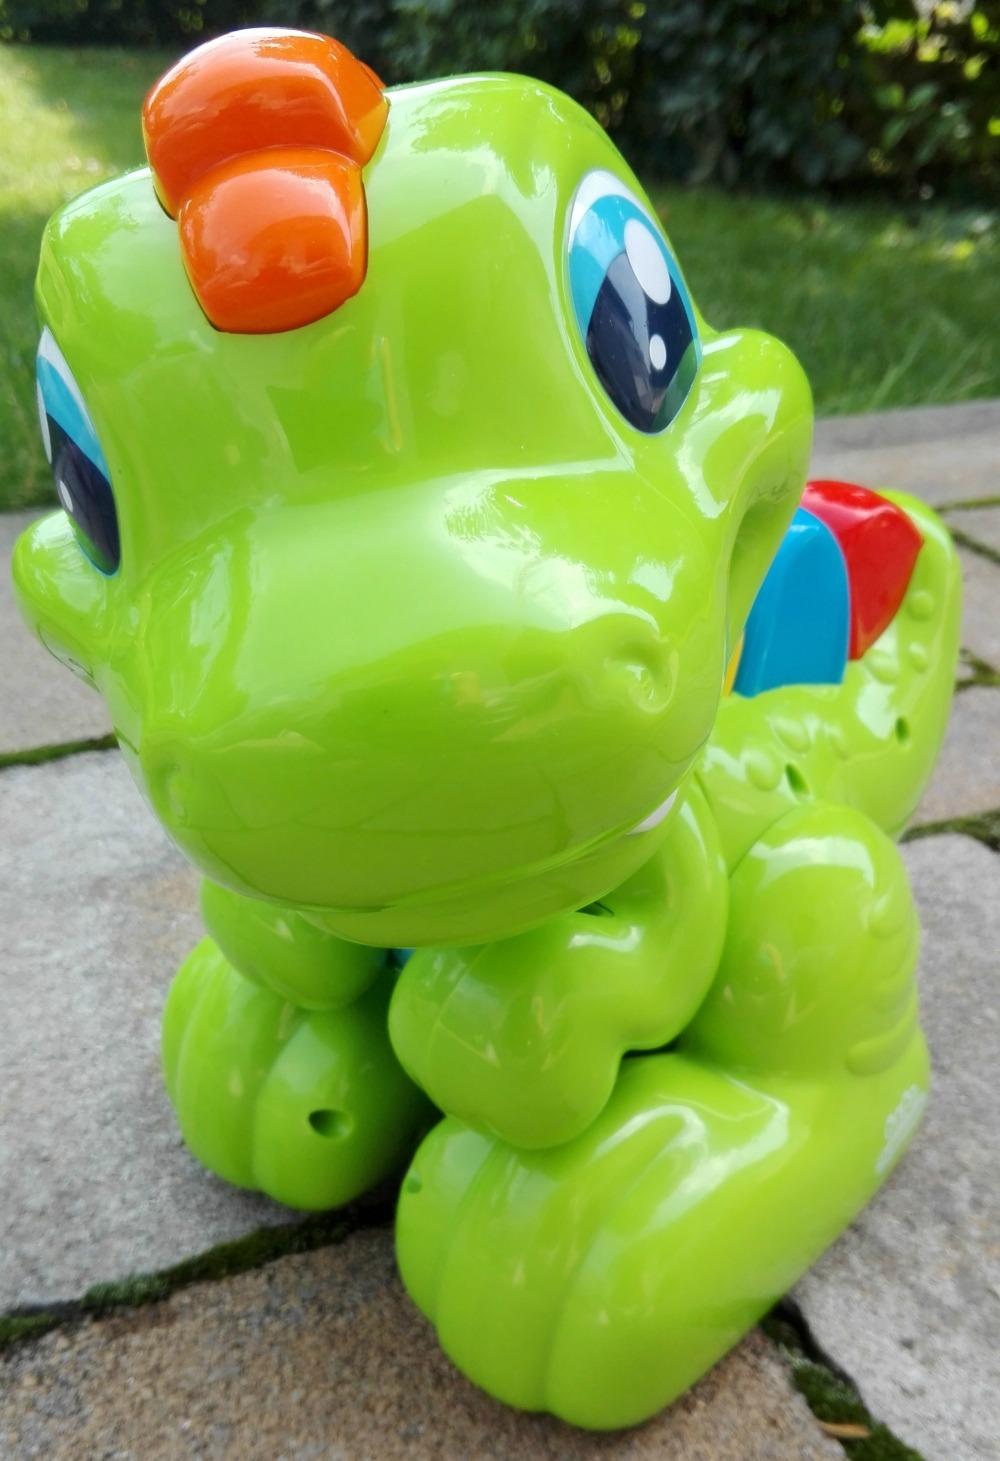 Baby T-Rex Clementoni Erfahrung Empfehlung